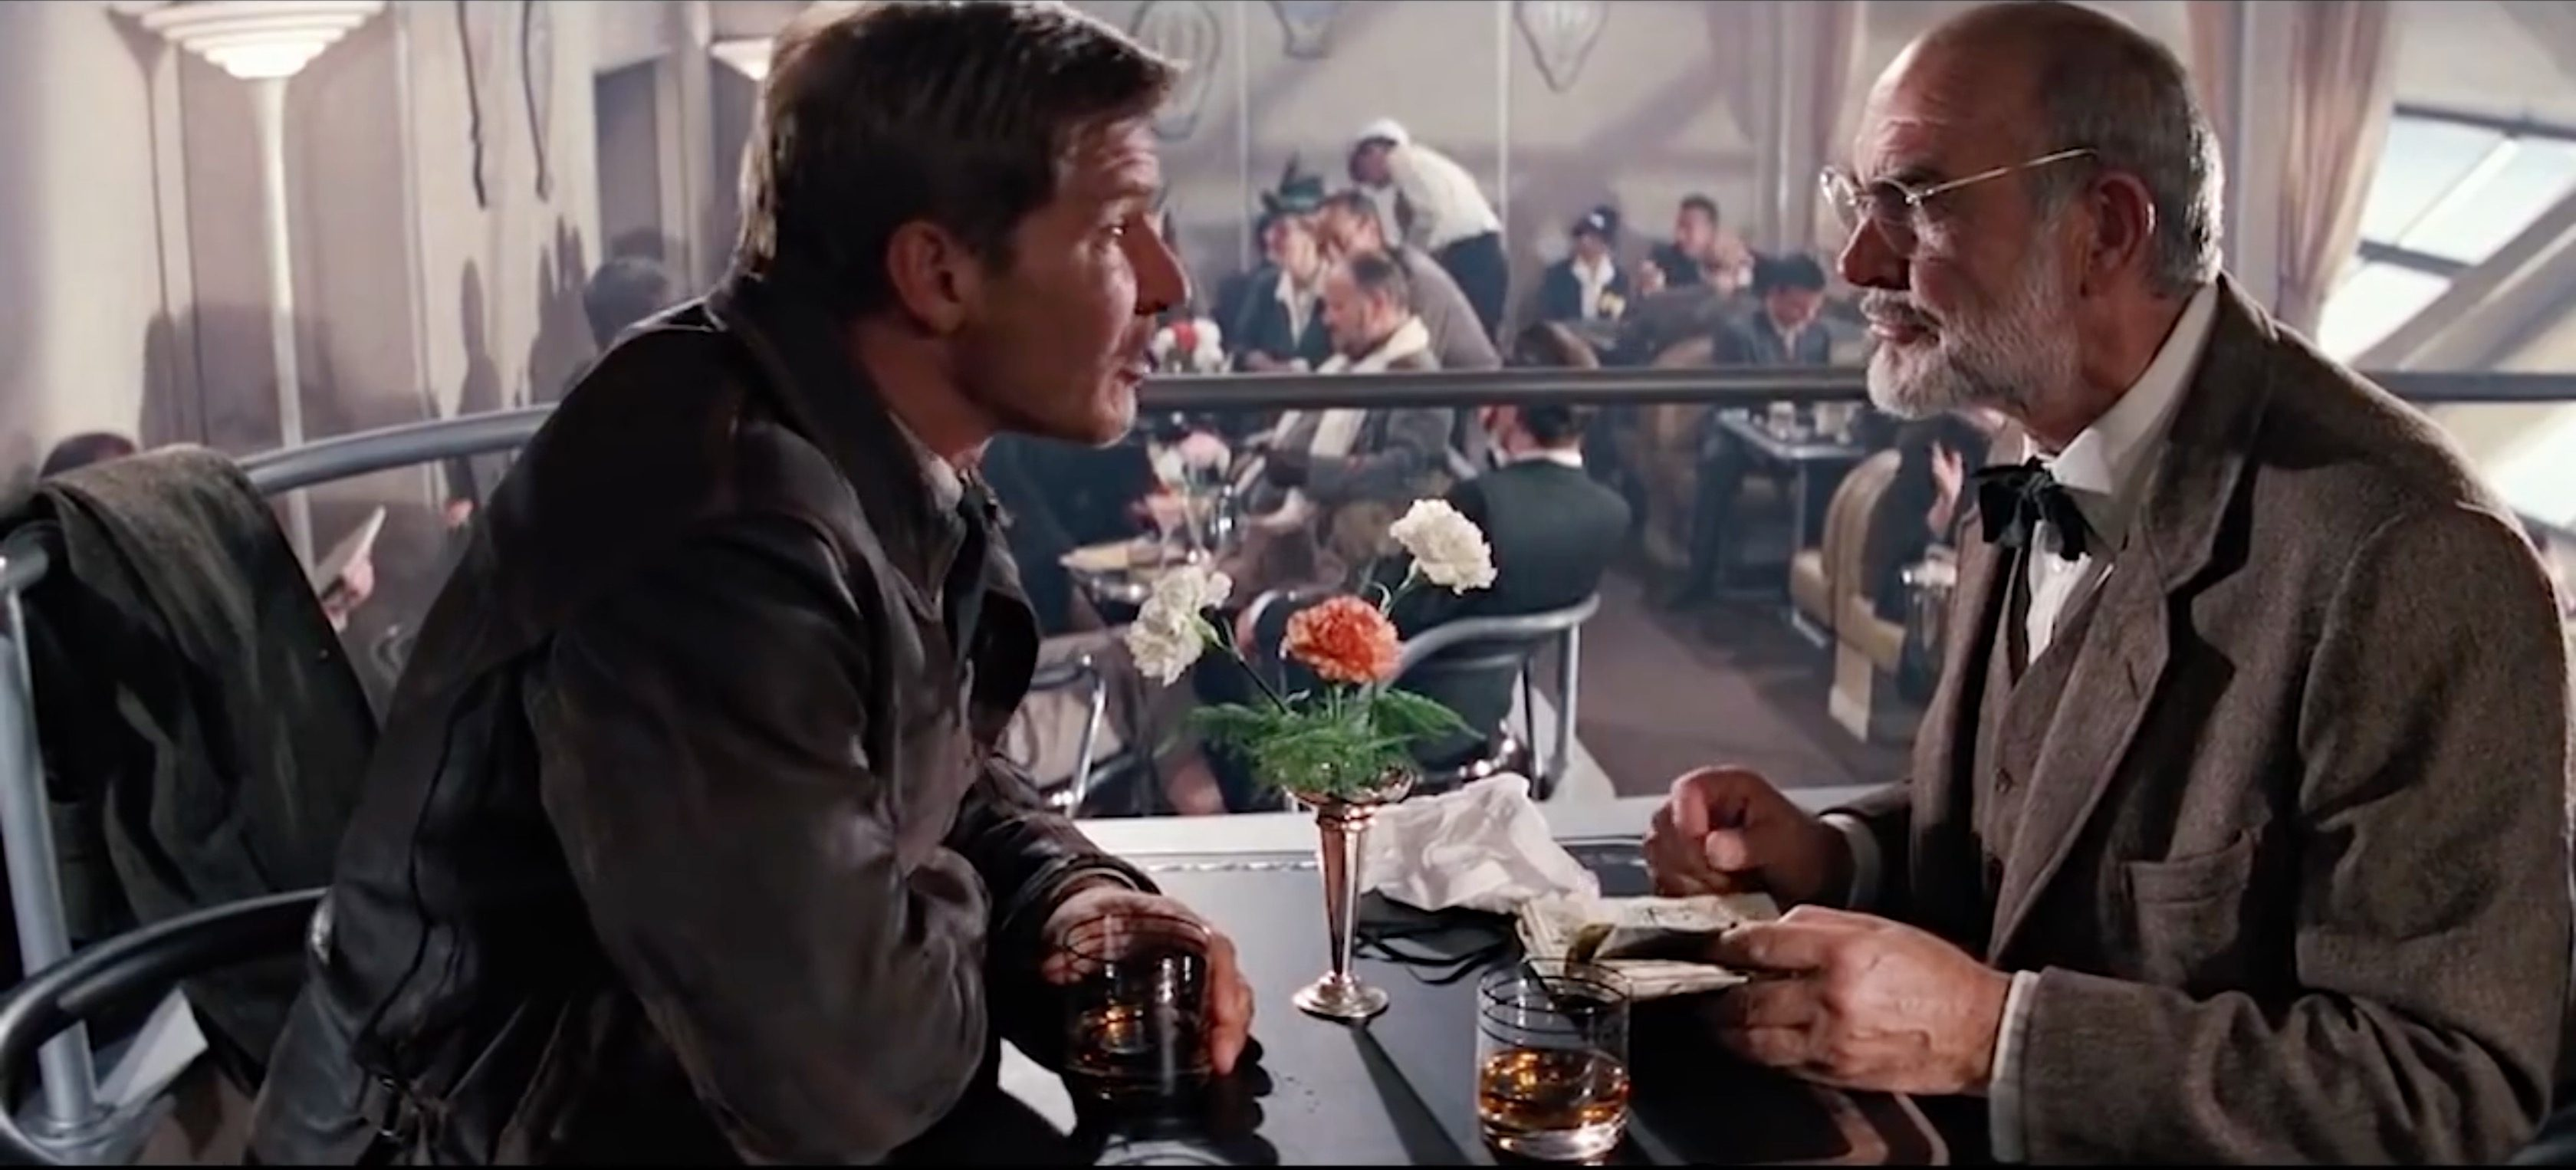 10 Great Movie Scenes That Actors Improvised